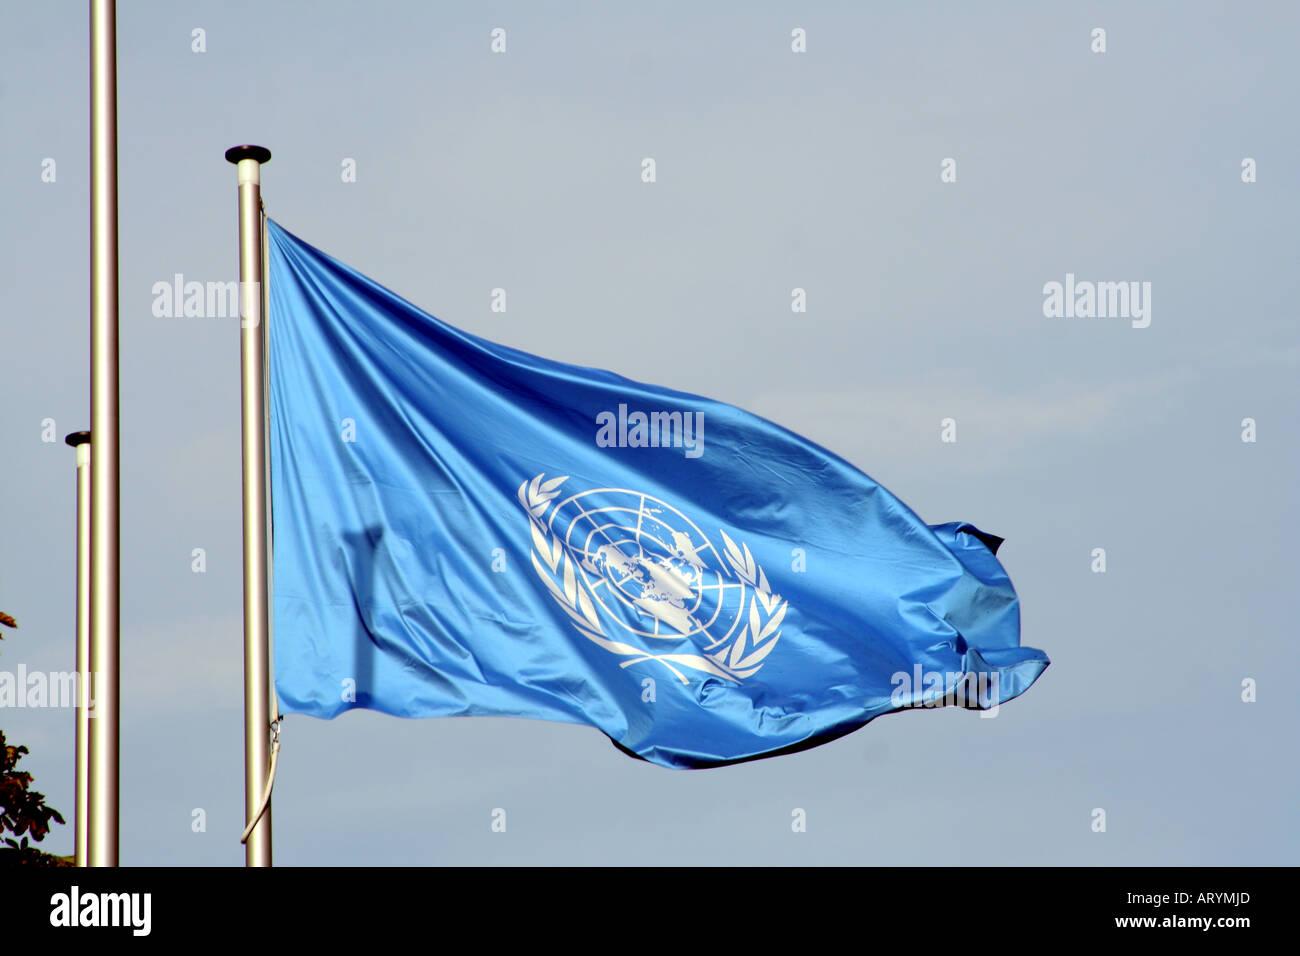 United Nations flag at Tall Eugen building Bonn North Rhine Westphalia Germany Europe - Stock Image